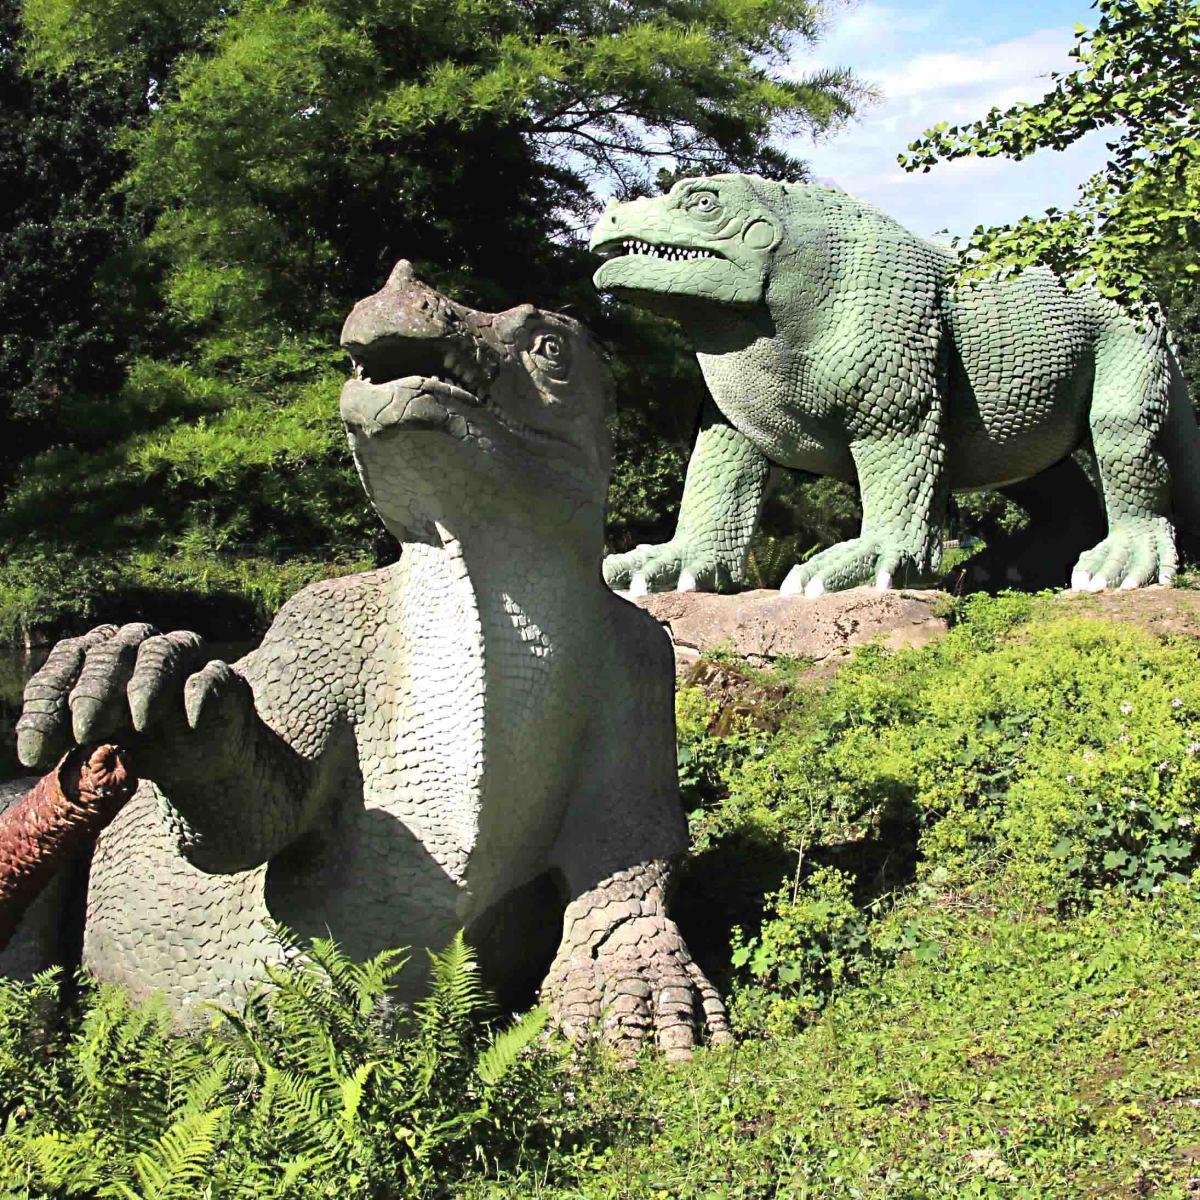 The Crystal Palace Dinosaurs photogrphed on Dinosaur Island